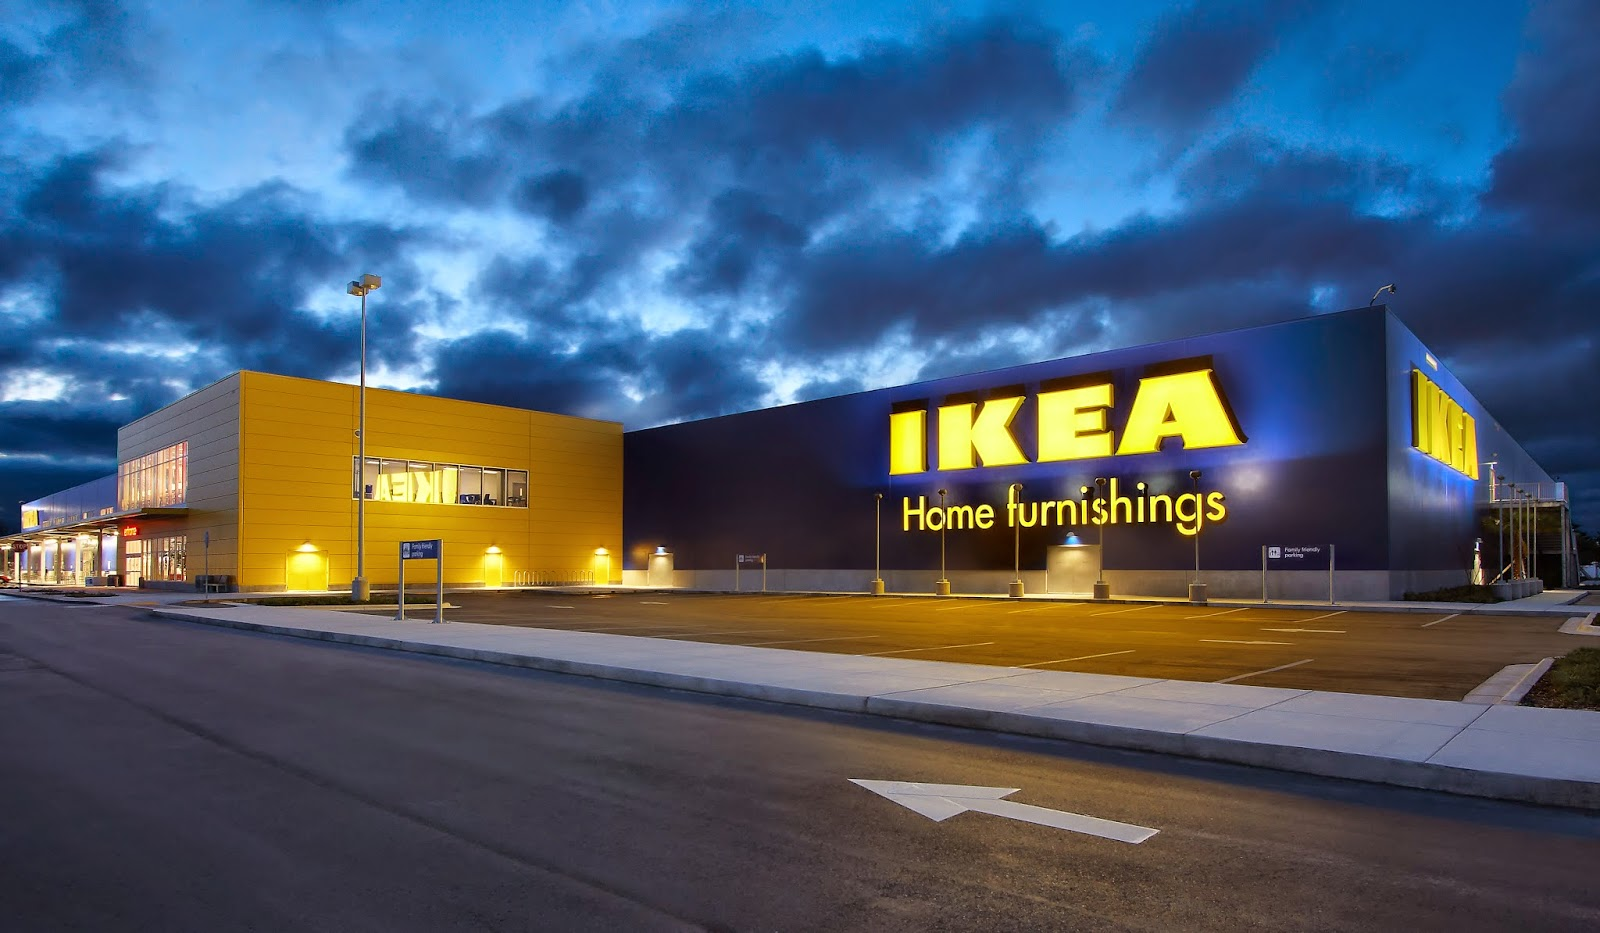 http://3.bp.blogspot.com/-23Roka0bKzU/VUTXjsFiGXI/AAAAAAAAAc0/BedNAslQ7tc/s1600/Ikea-1432.jpg